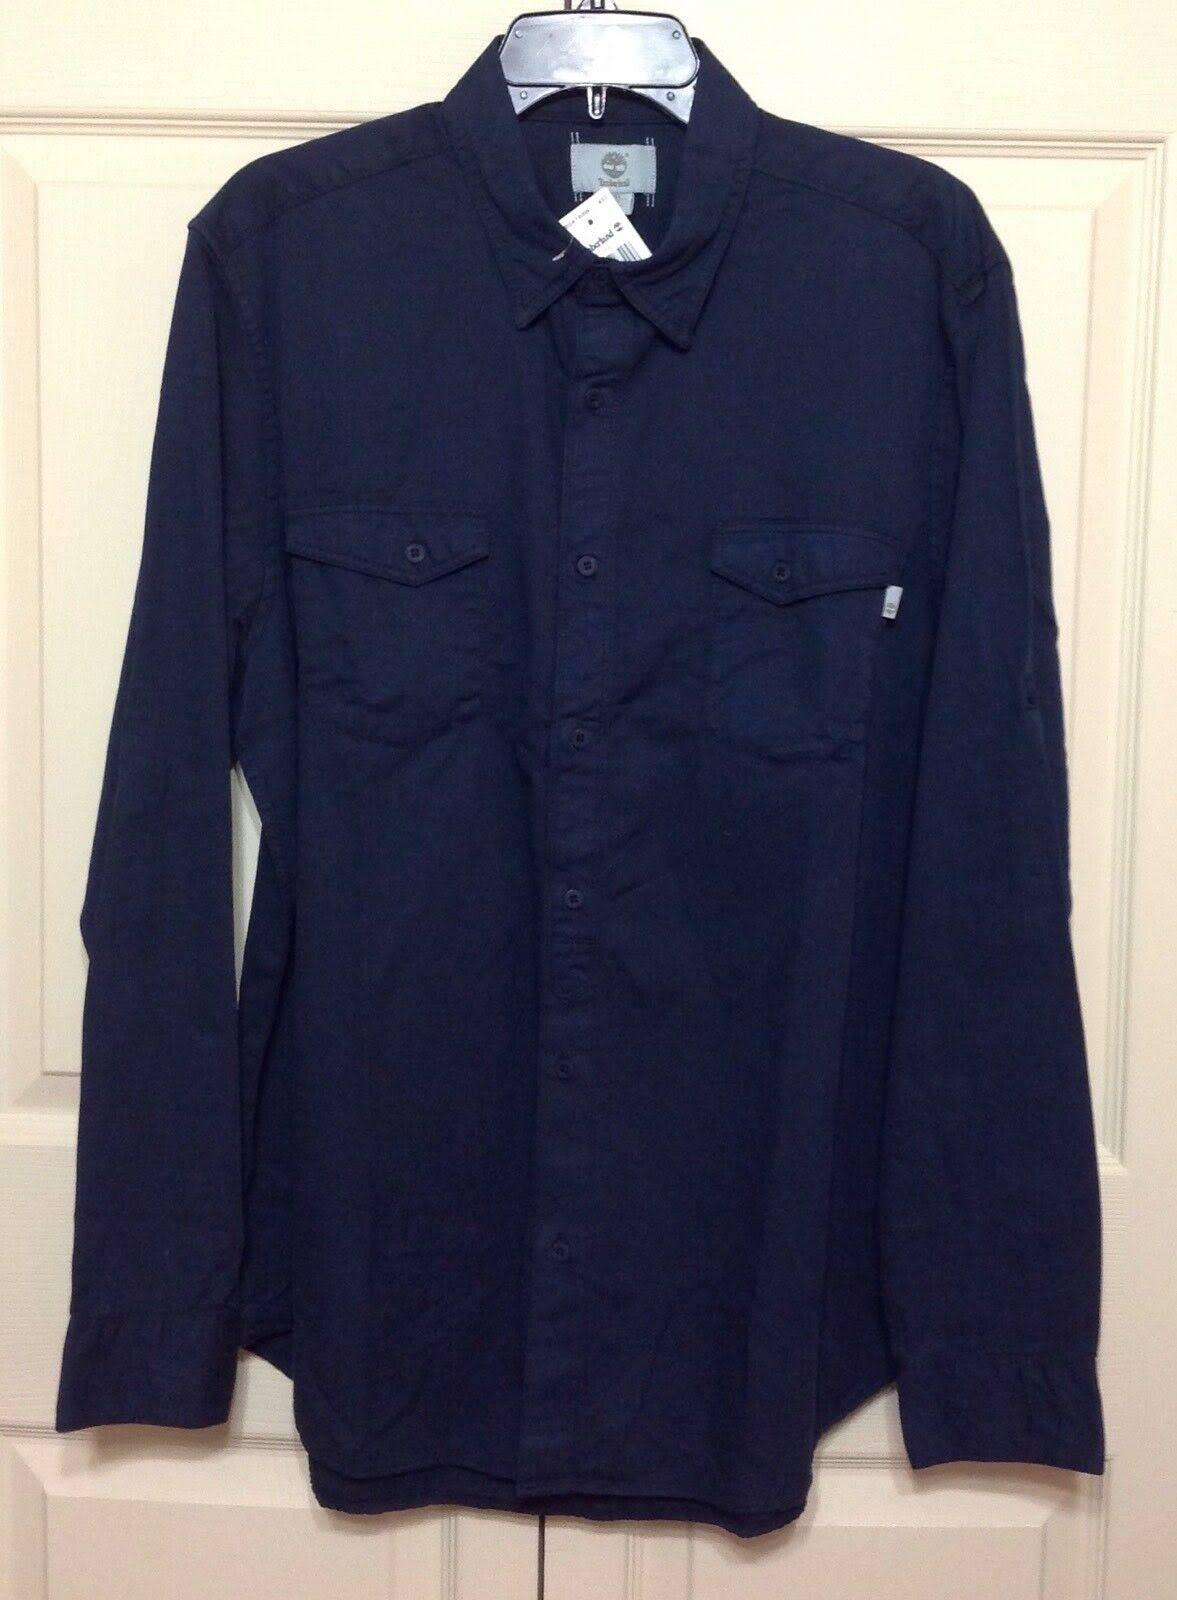 Shirt Hombres Larga Twill Manga Timberland Tab 78 Azul Roll Cargo Grande Tamaño B0R0qE